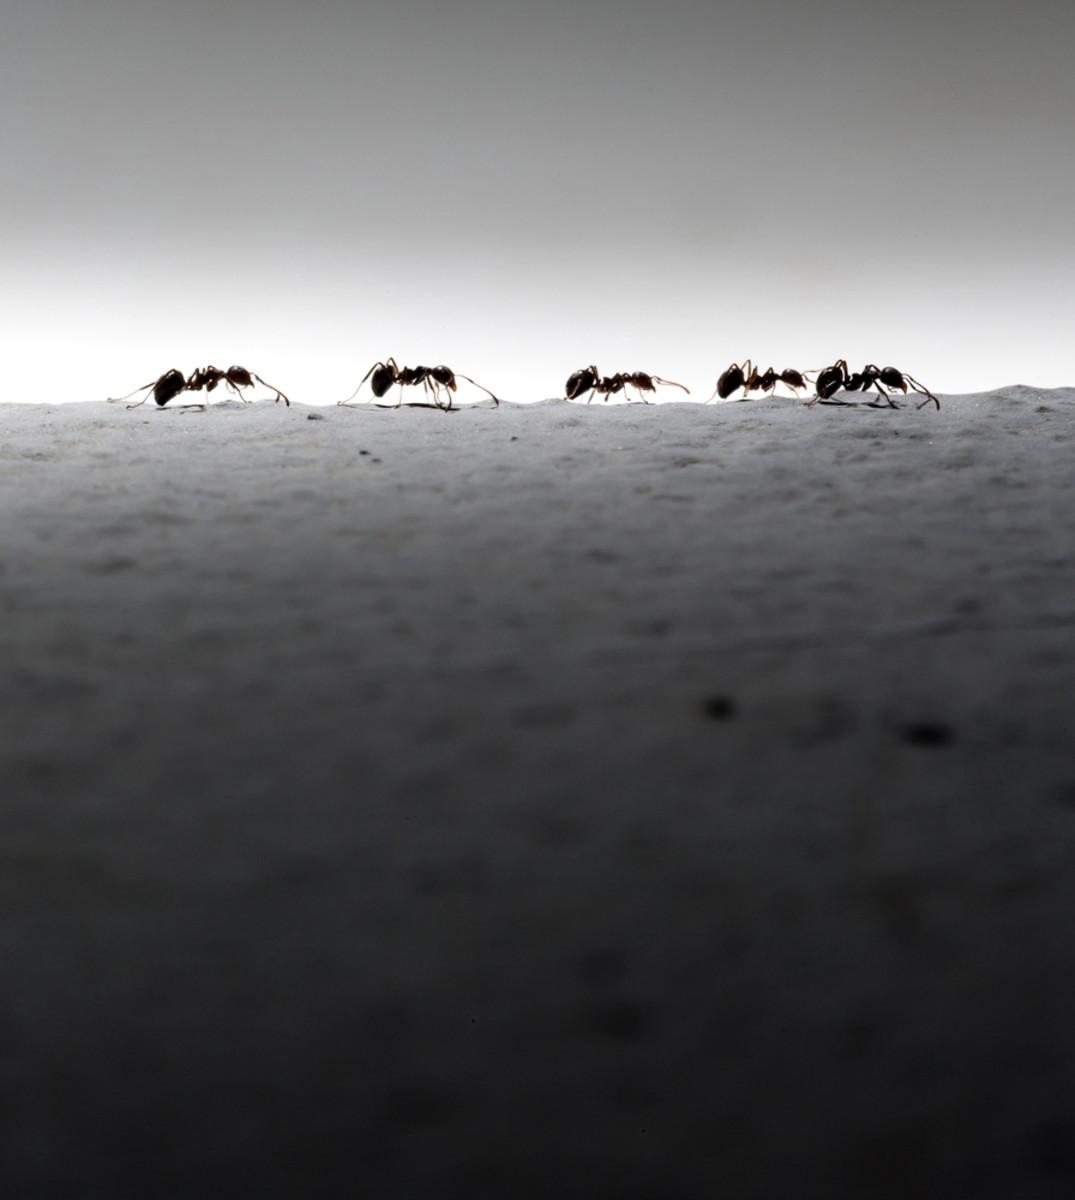 (Photo: Kietisak Yaemklebbua/Shutterstock)